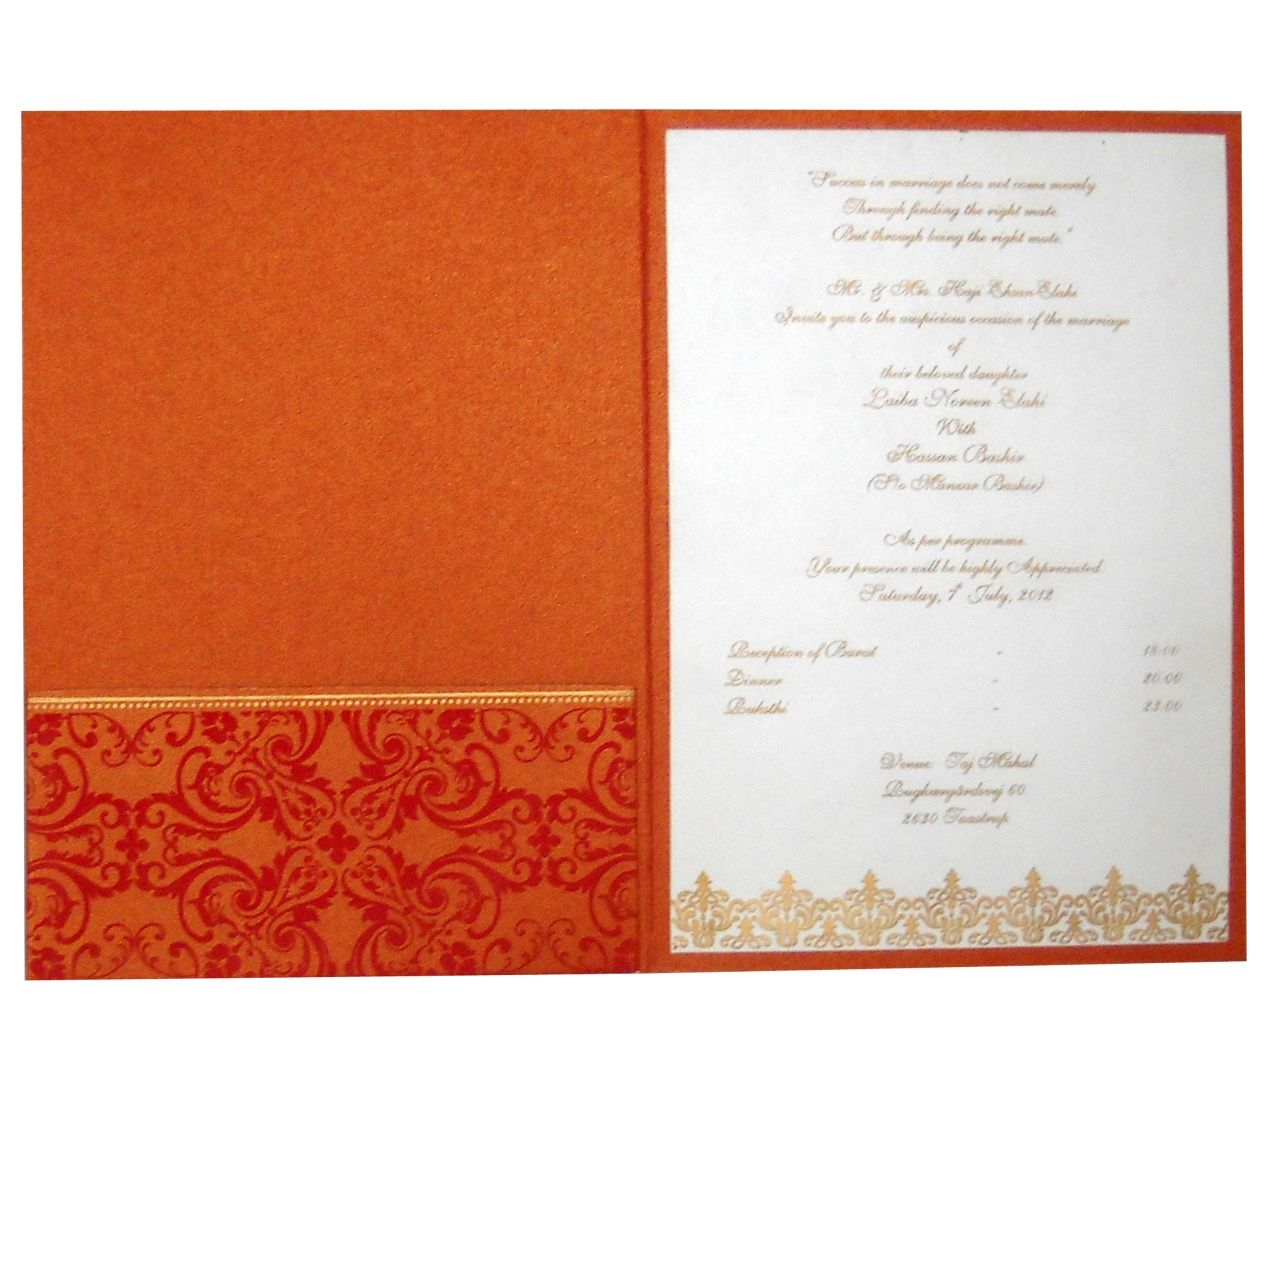 muslim wedding invitations mumbai%0A Latest Trendy Indian Wedding Card Design in Orange Color